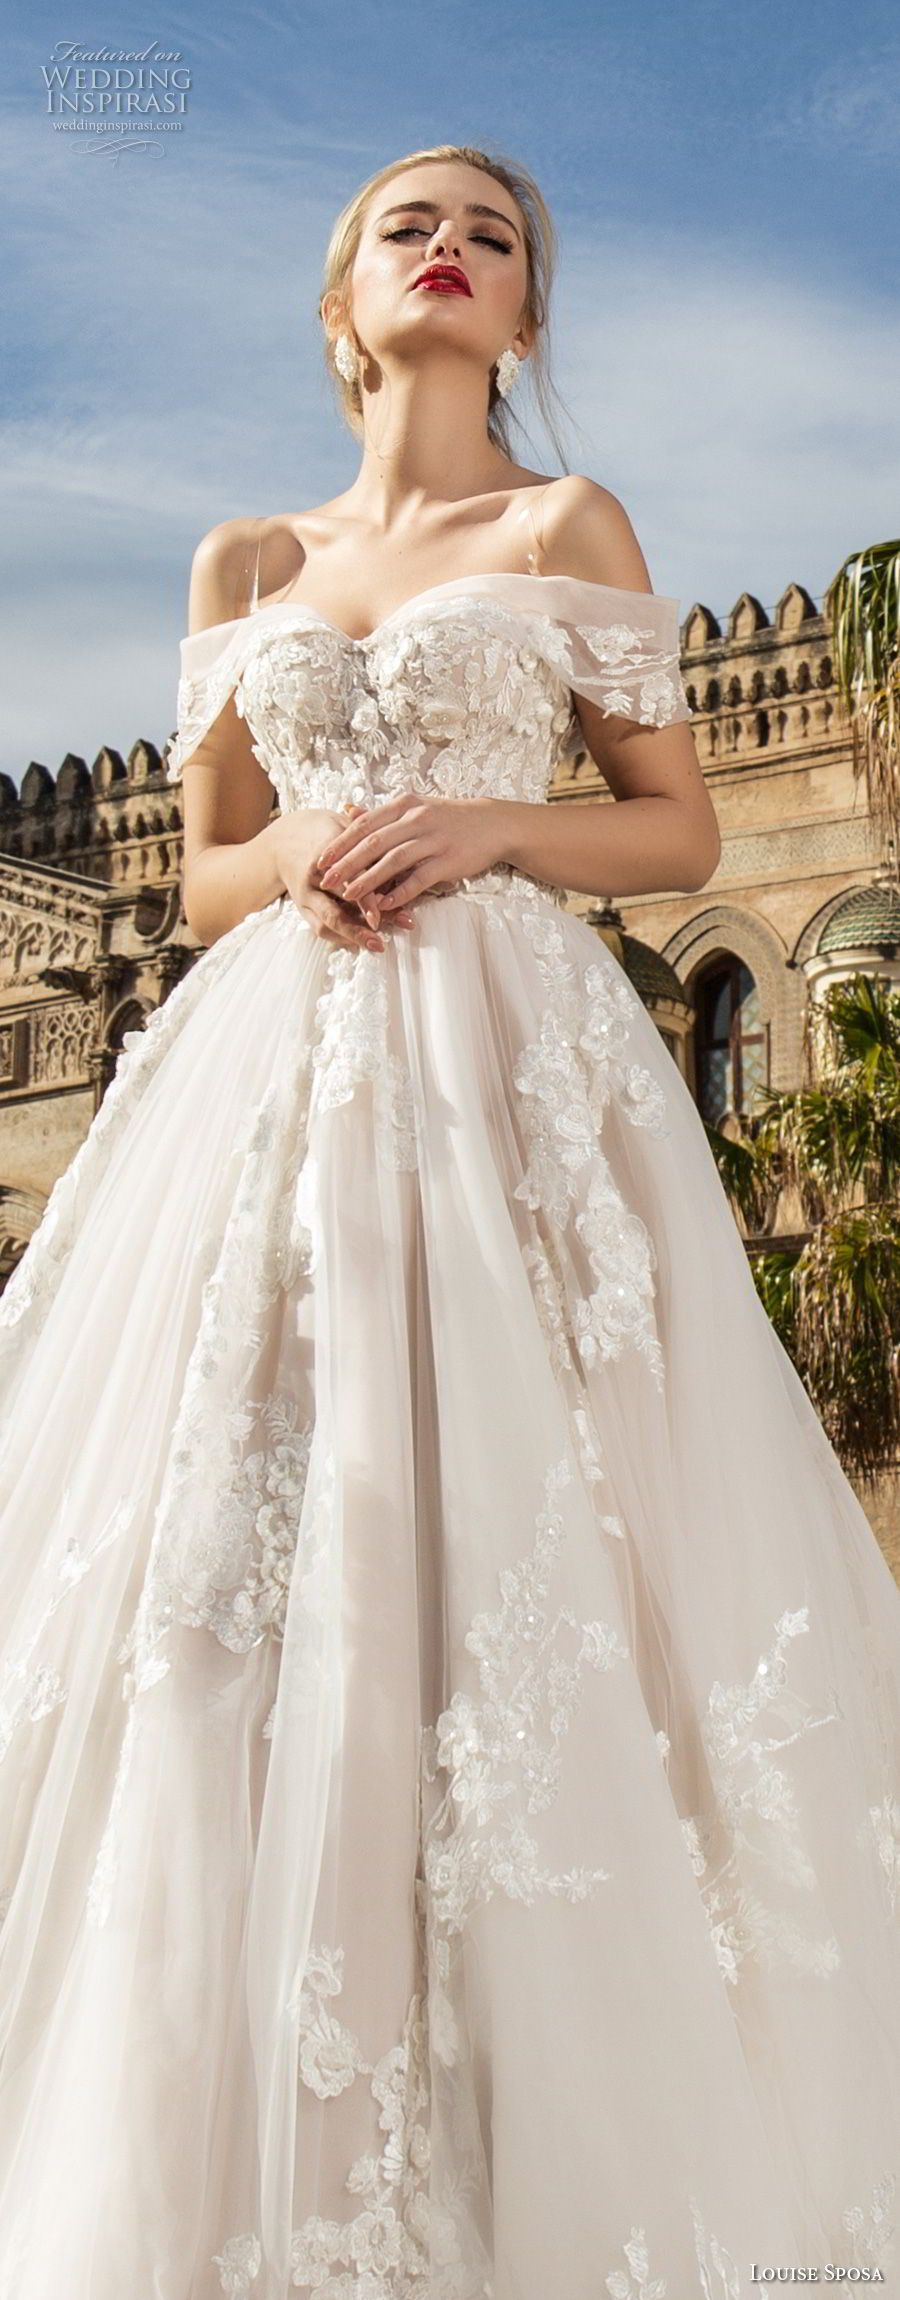 Louise Sposa 2018 Wedding Dresses  wedding dresses and